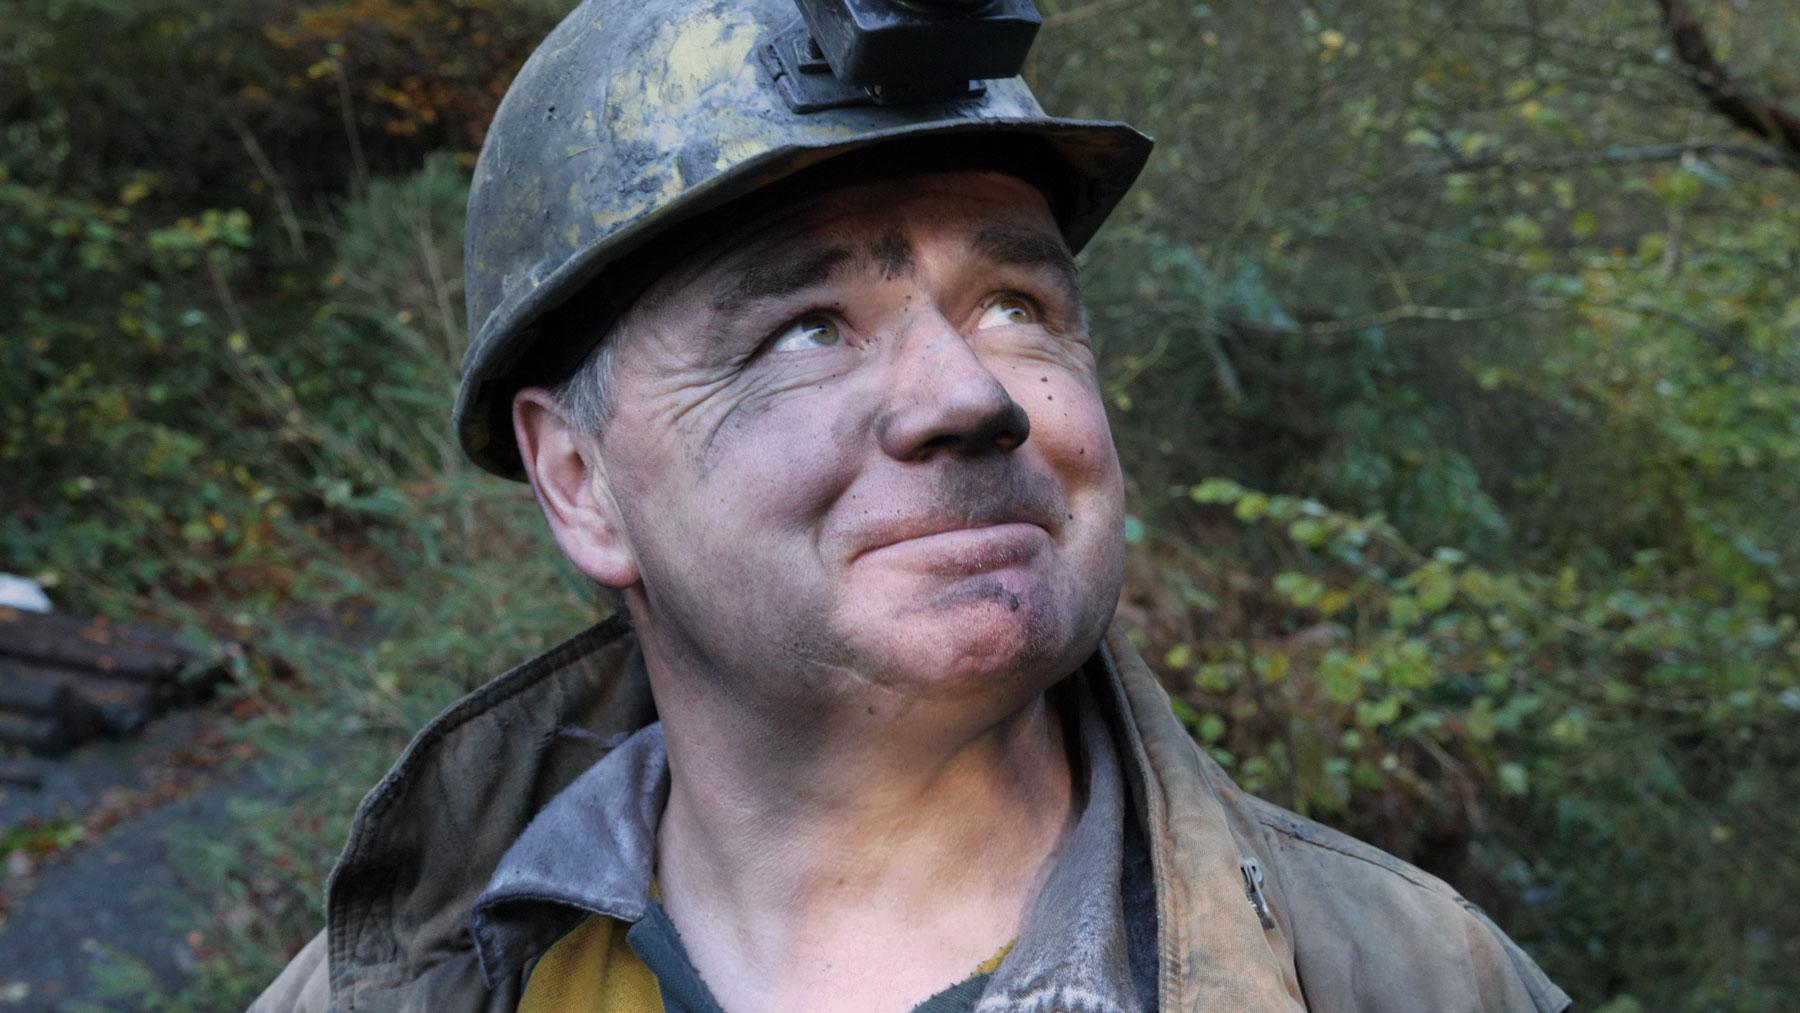 The Last Miner - Directed by Luke Brabazon